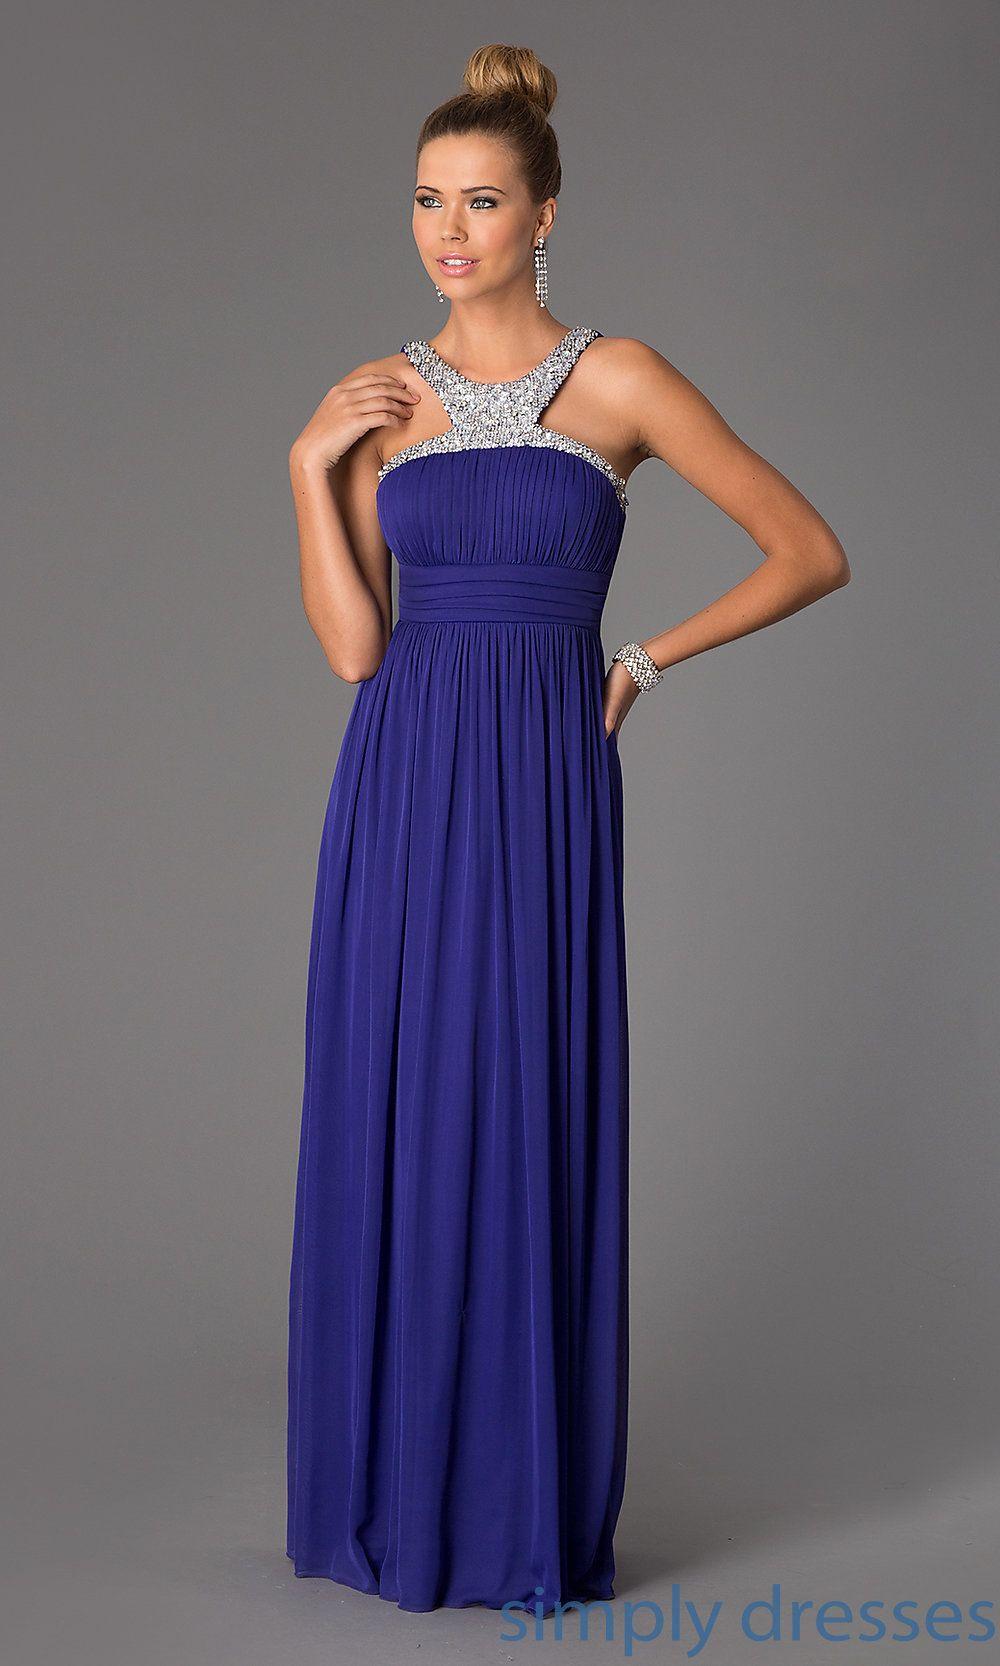 Homecoming Dresses, Formal Prom Dresses, Evening Wear: CT-8420BQ1B ...